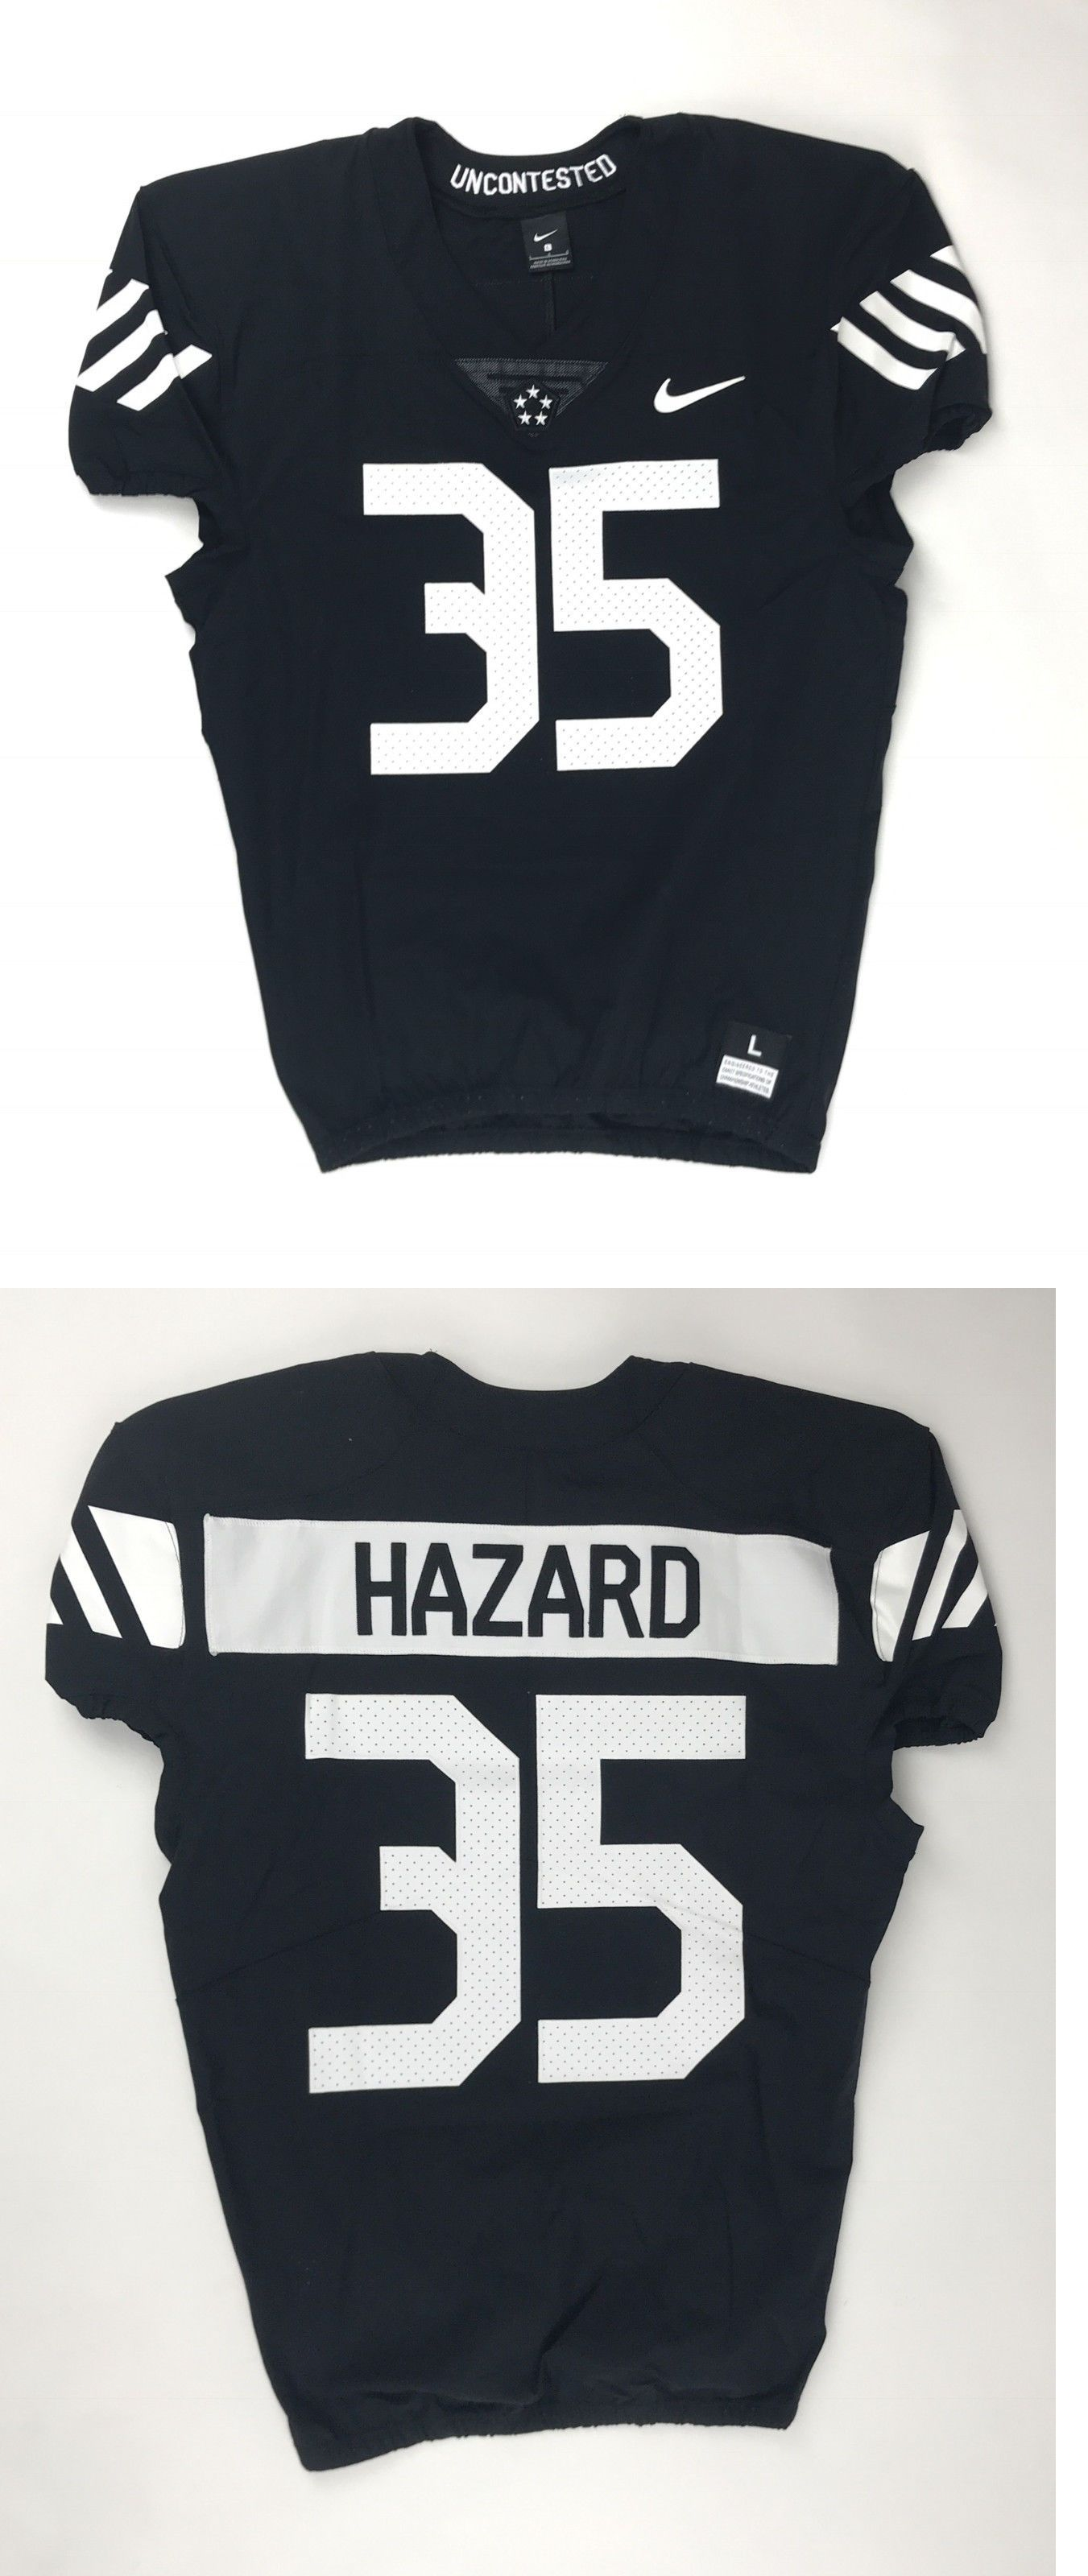 3aa740116 Clothing 21218  New Nike Vapor Pro Hazard  35 Football Jersey Men S Large  Black 908635 -  BUY IT NOW ONLY   34.99 on  eBay  clothing  vapor  hazard  ...